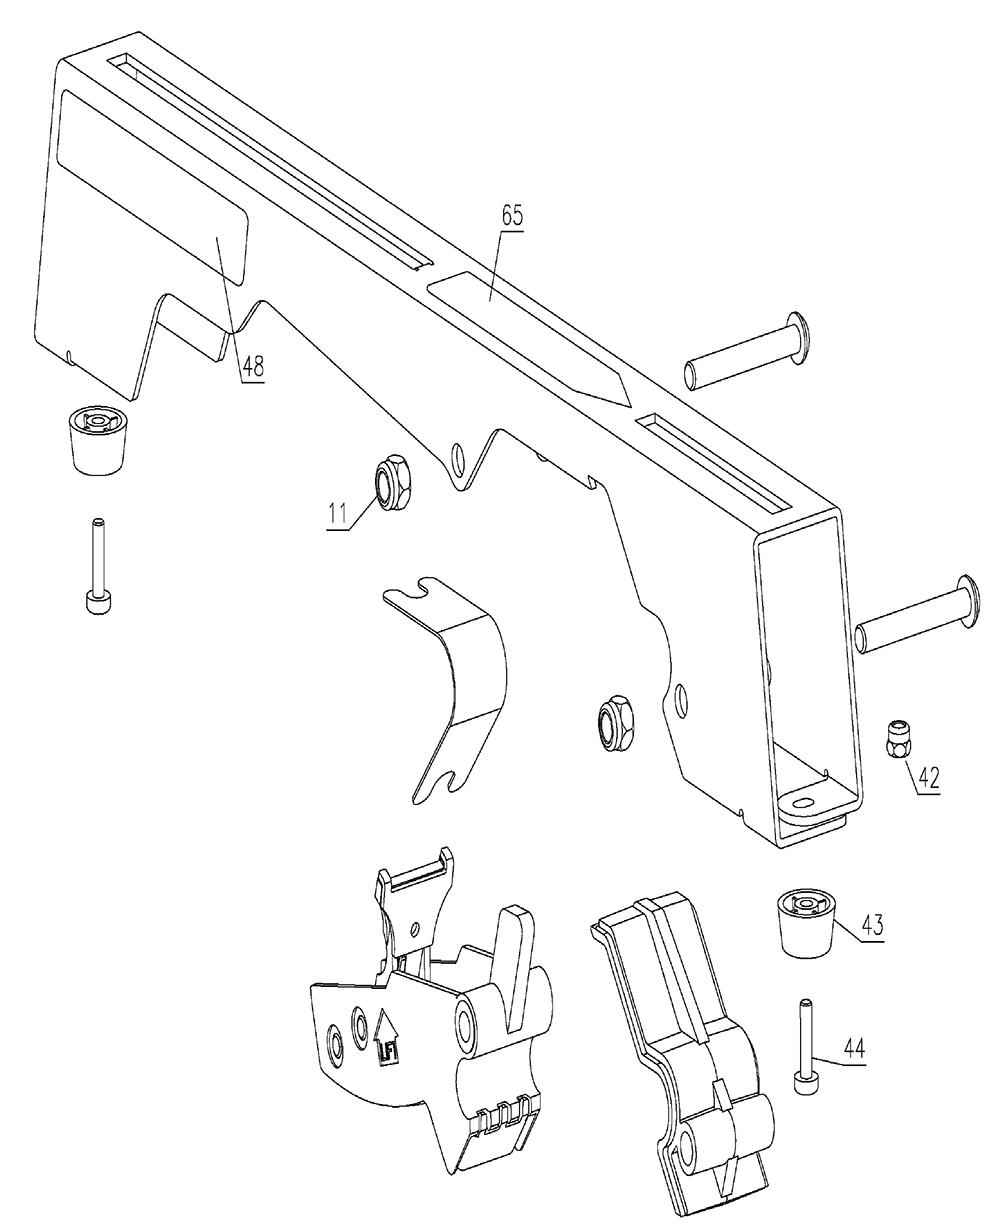 Dewalt Miter Saw Wiring Diagram Dw718 Wiring Diagram